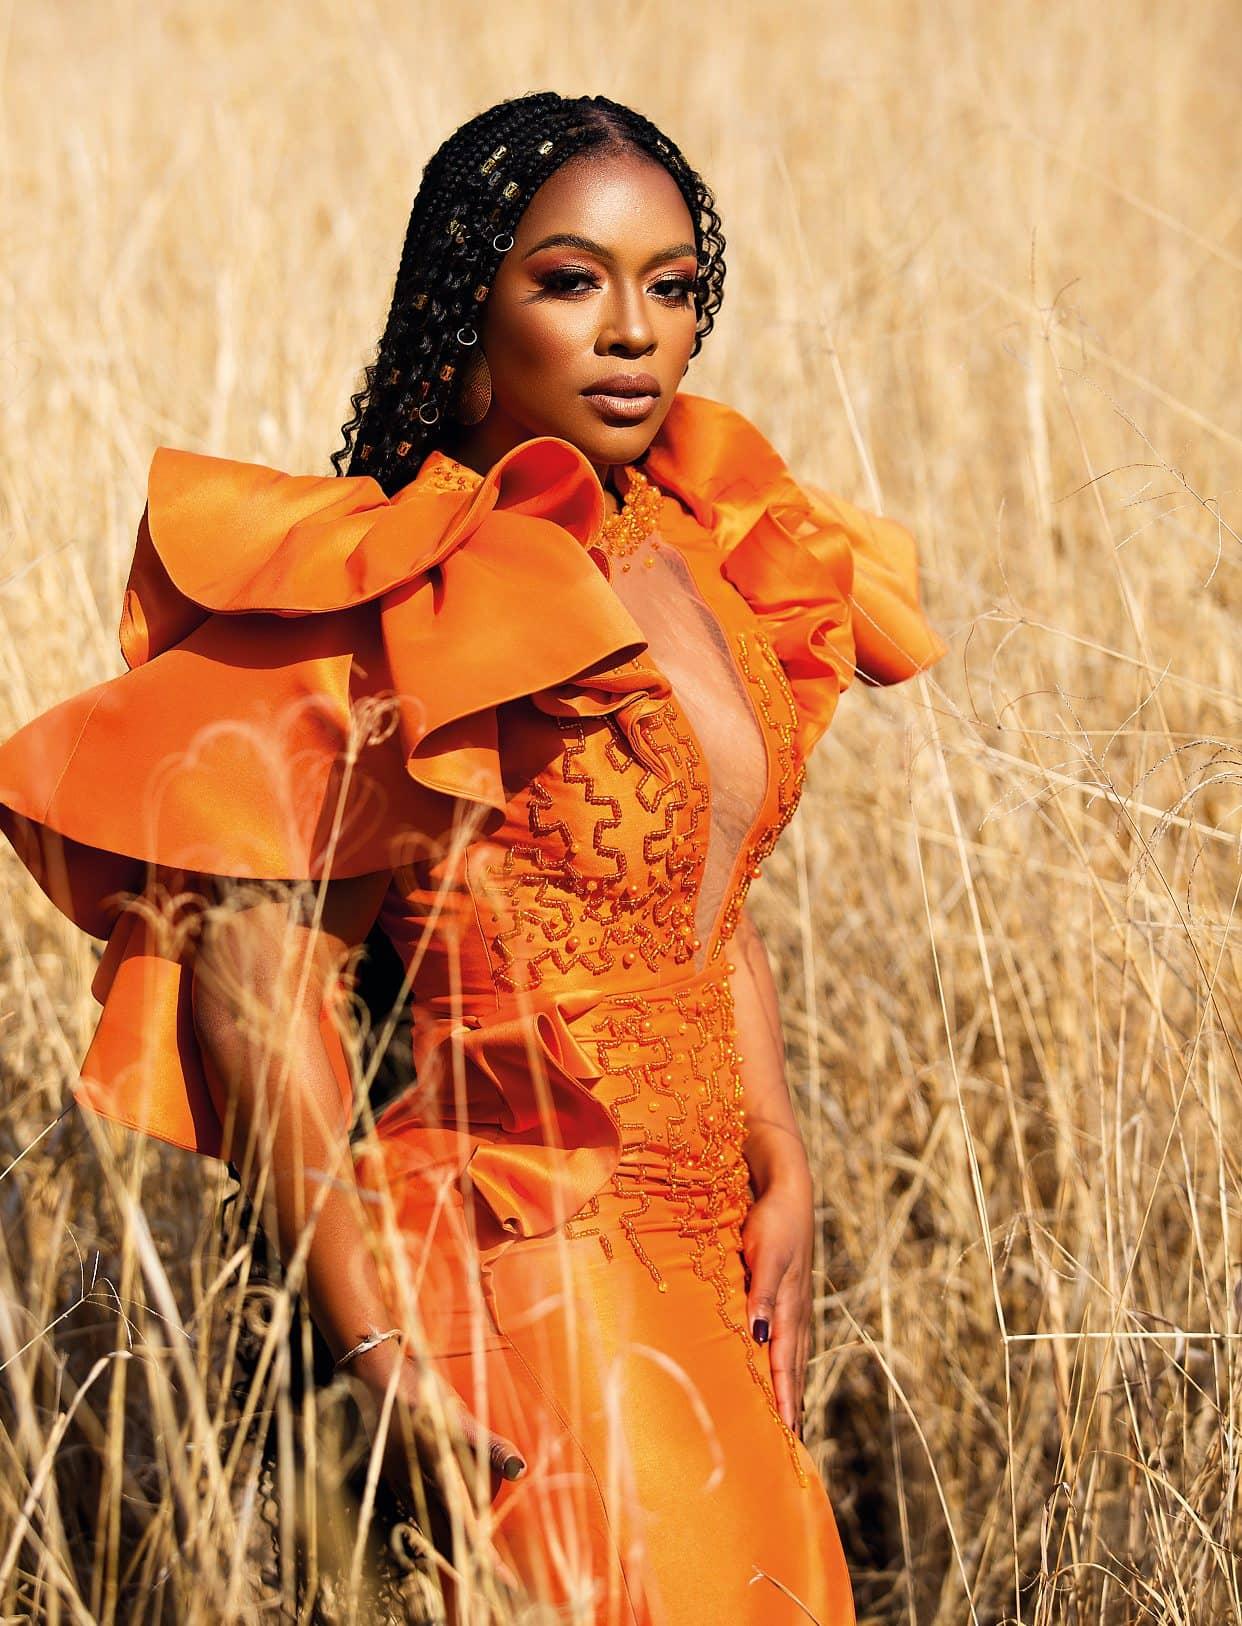 most-beautiful-women-africa-2020-nomzamo-mbatha